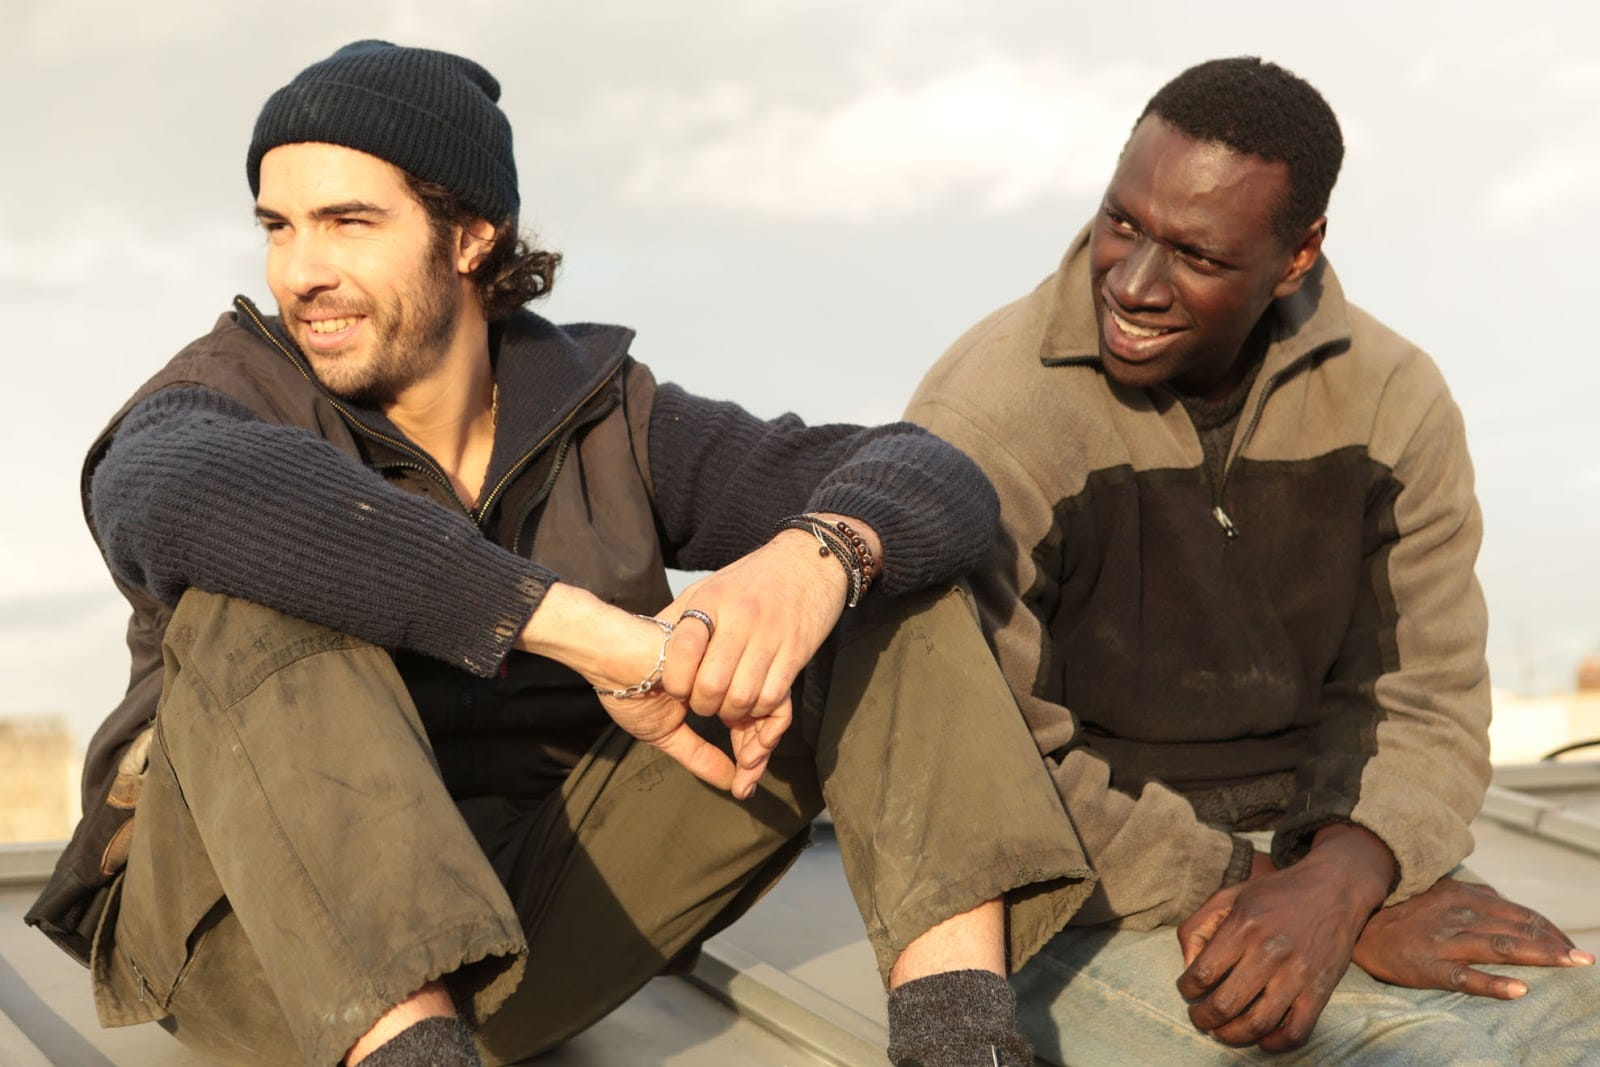 Samba d'Eric Toledano et Olivier Nakache image film cinéma